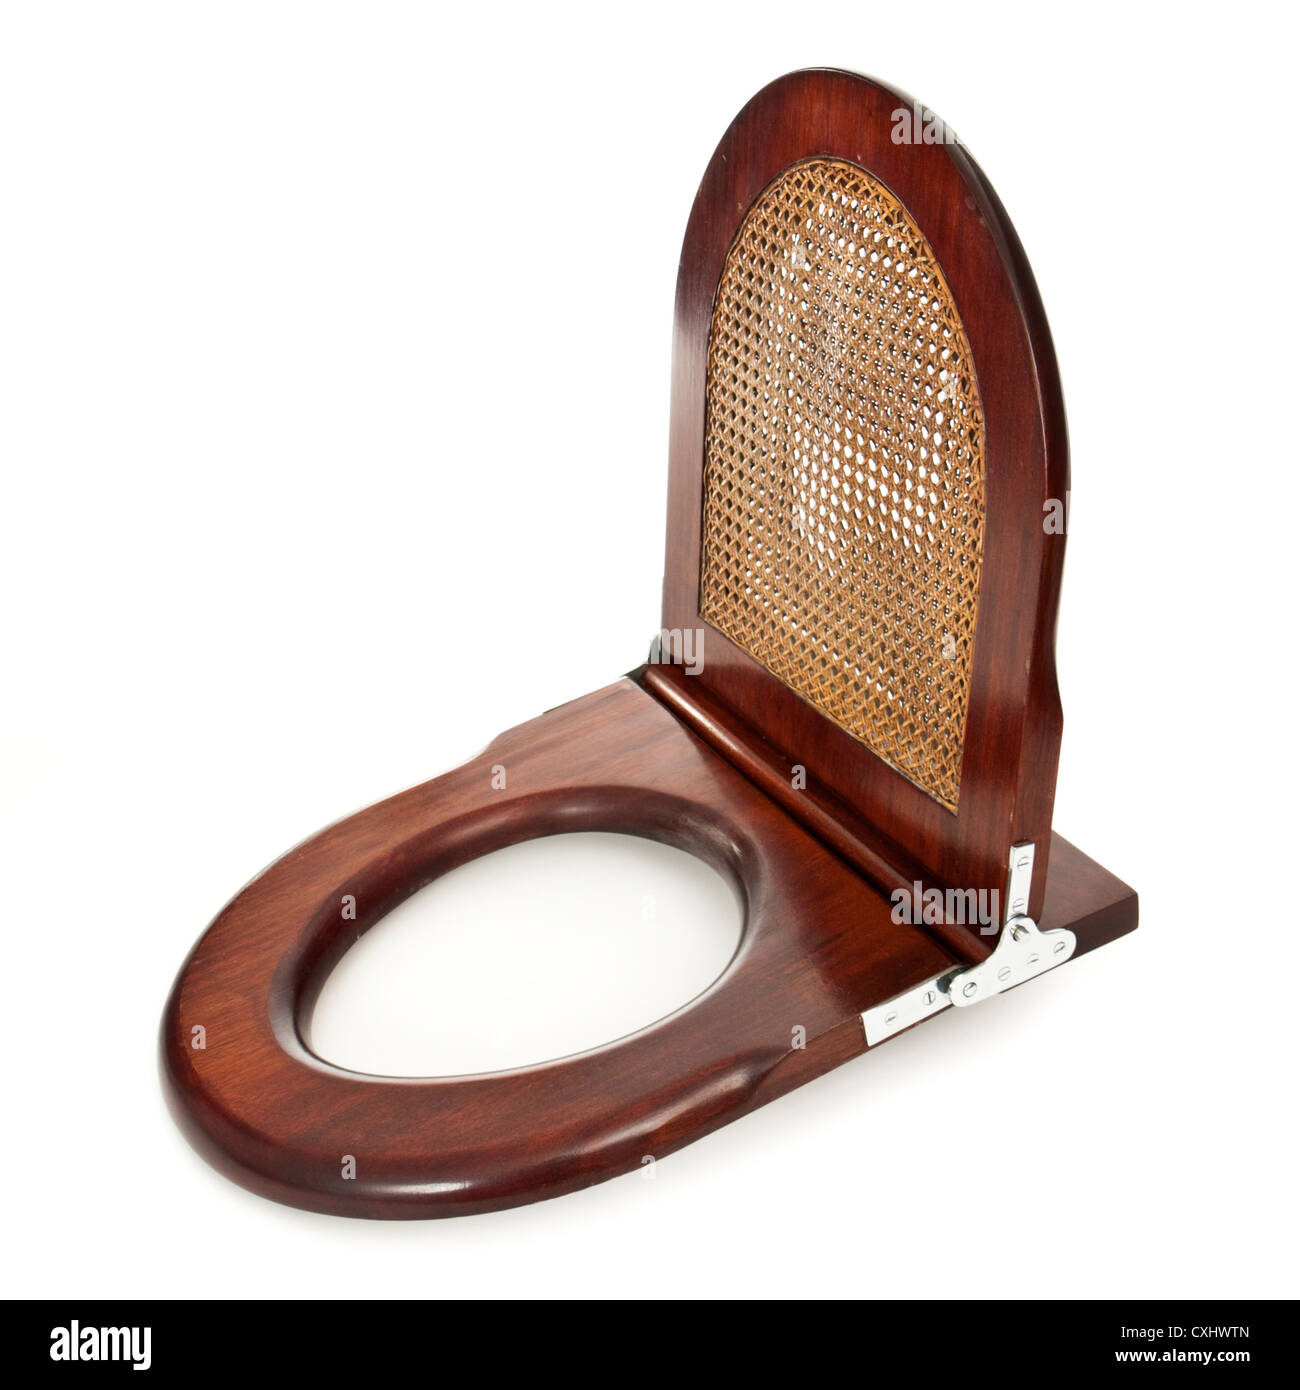 Antique mahogany toilet seat - Stock Image